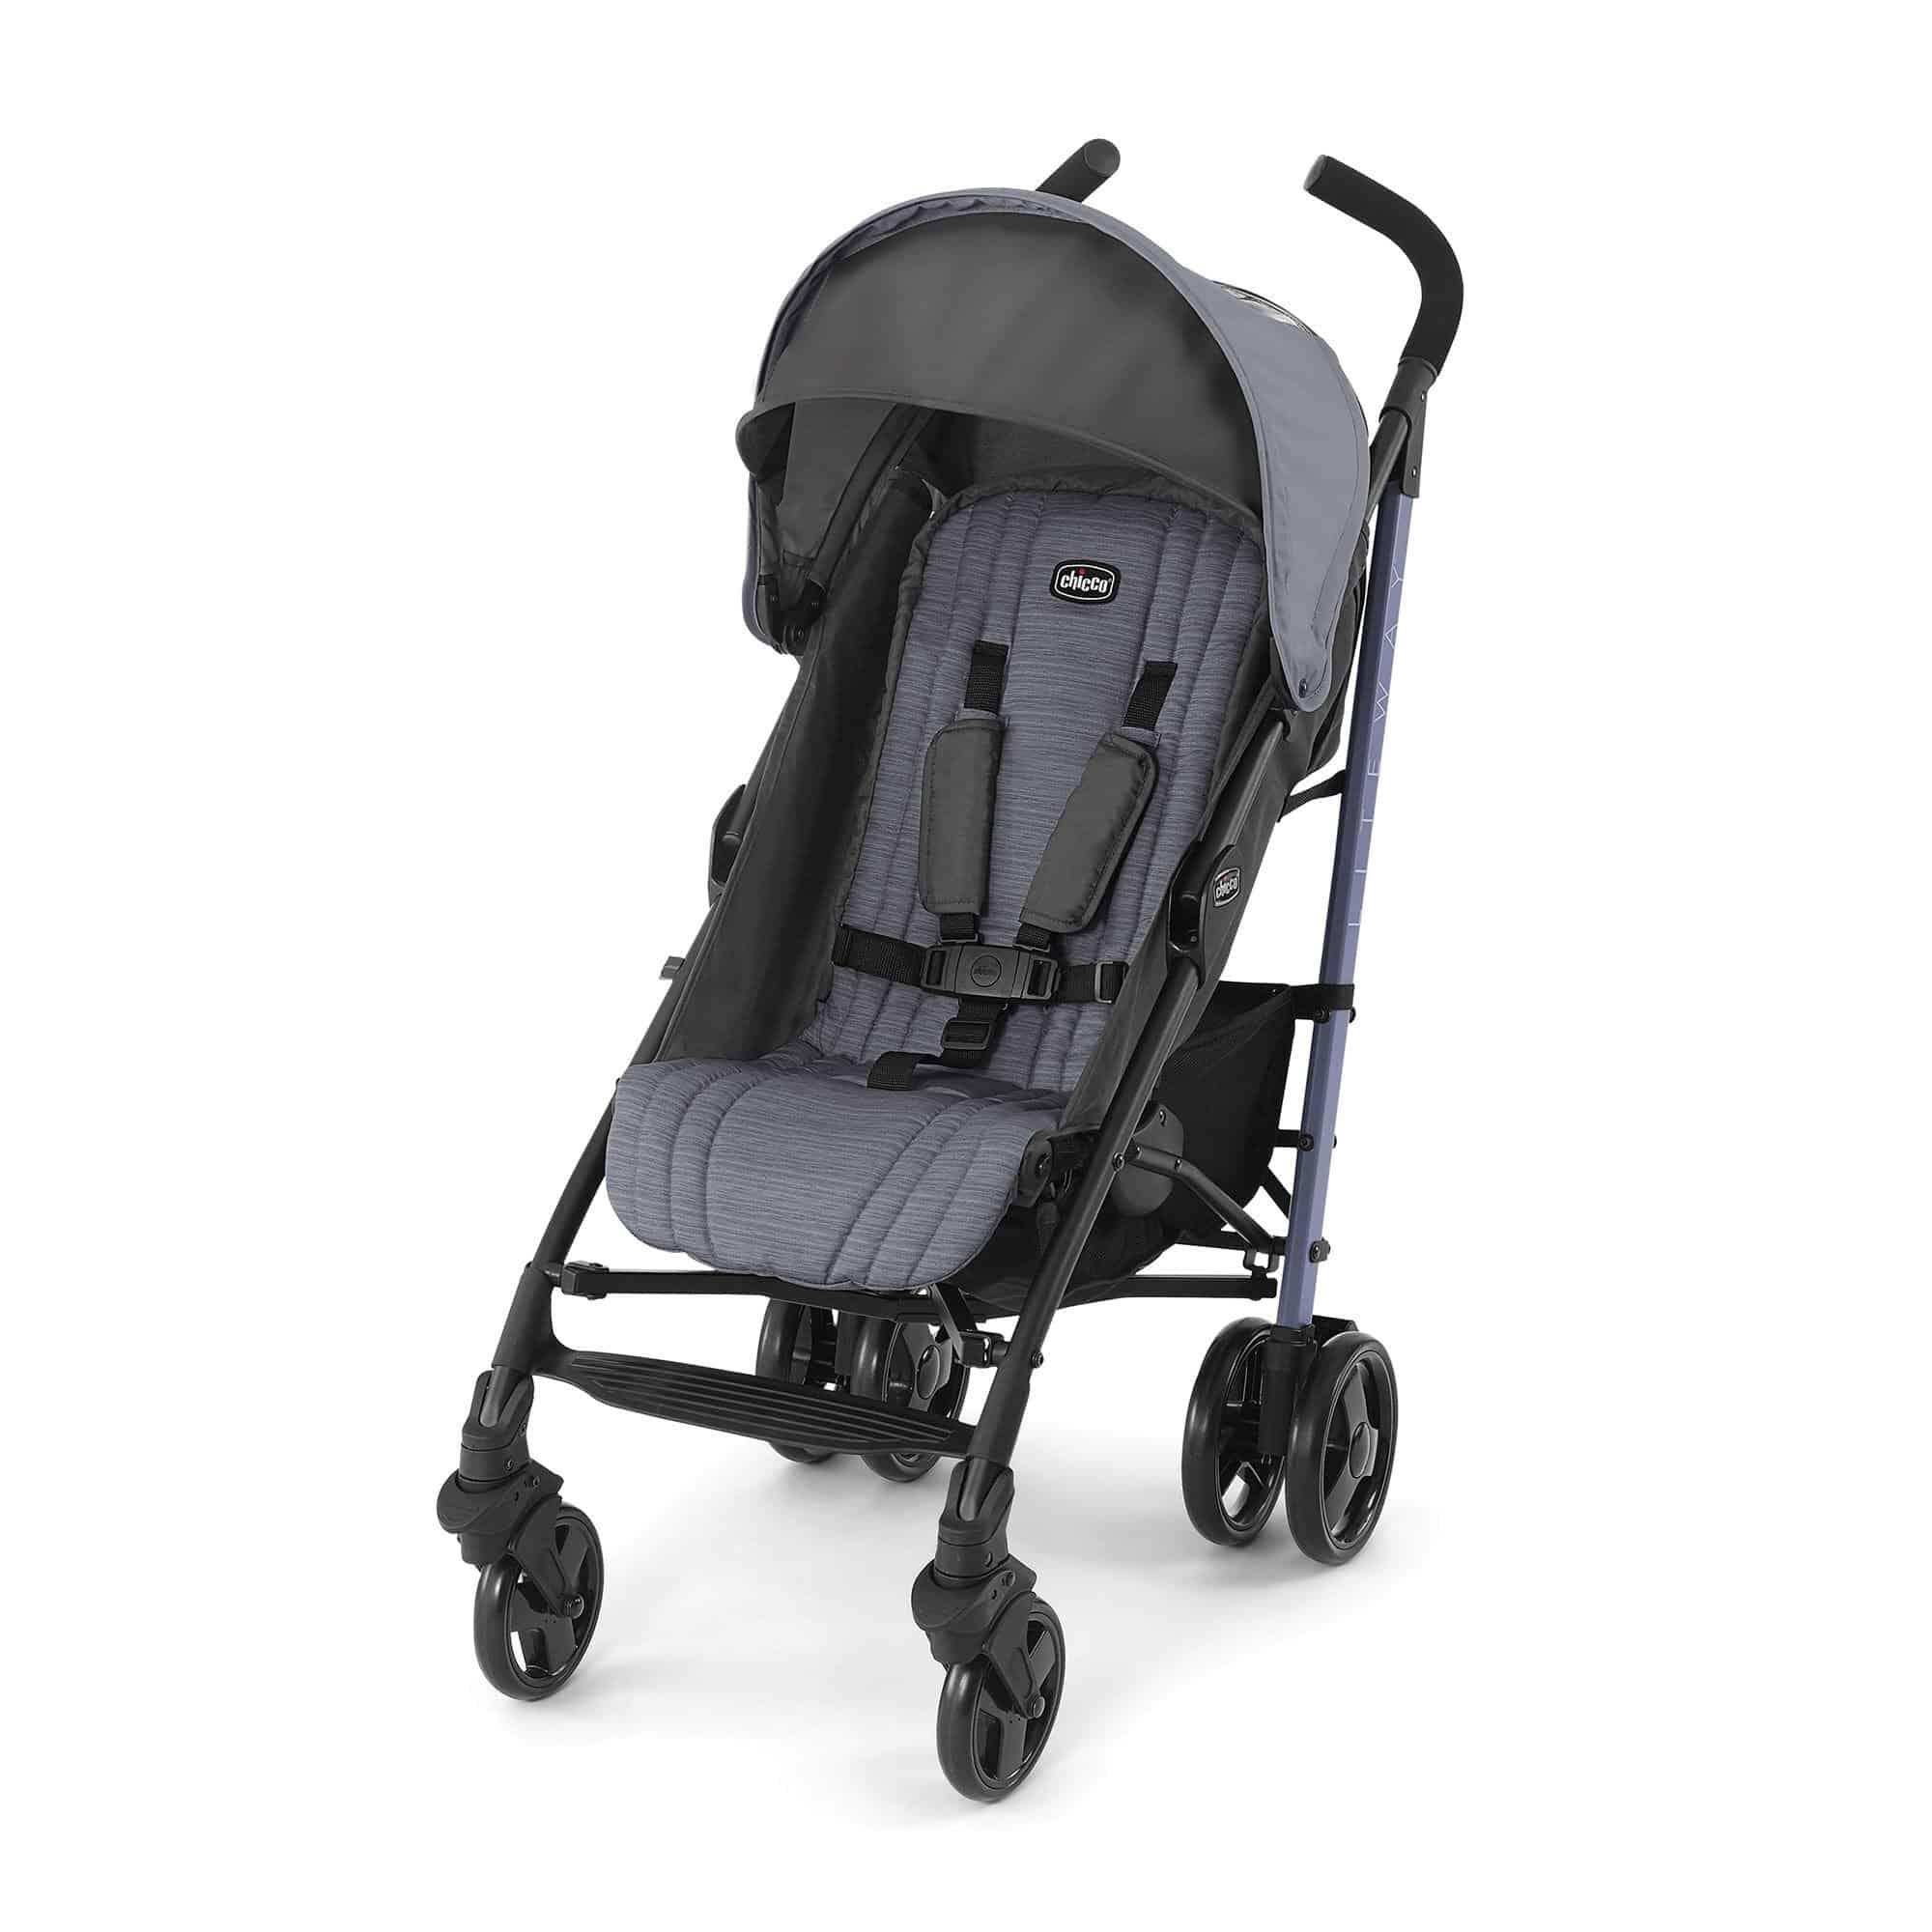 Chicco Liteway Stroller Review [Super Lightweight]